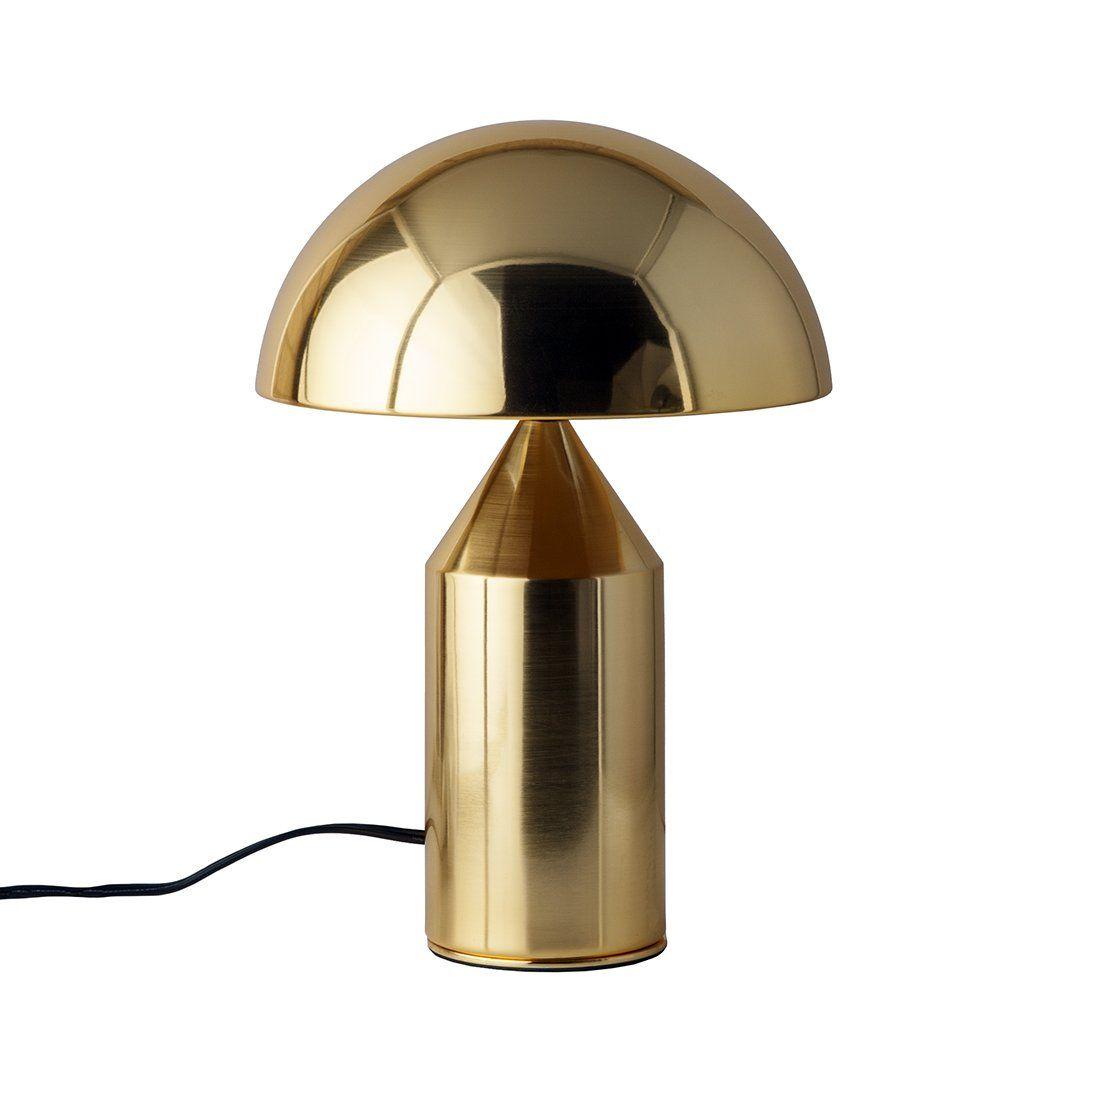 Mid Century Mushroom Table Lamp Brass In 2021 Brass Table Lamps Table Lamp Contemporary Table Lamps